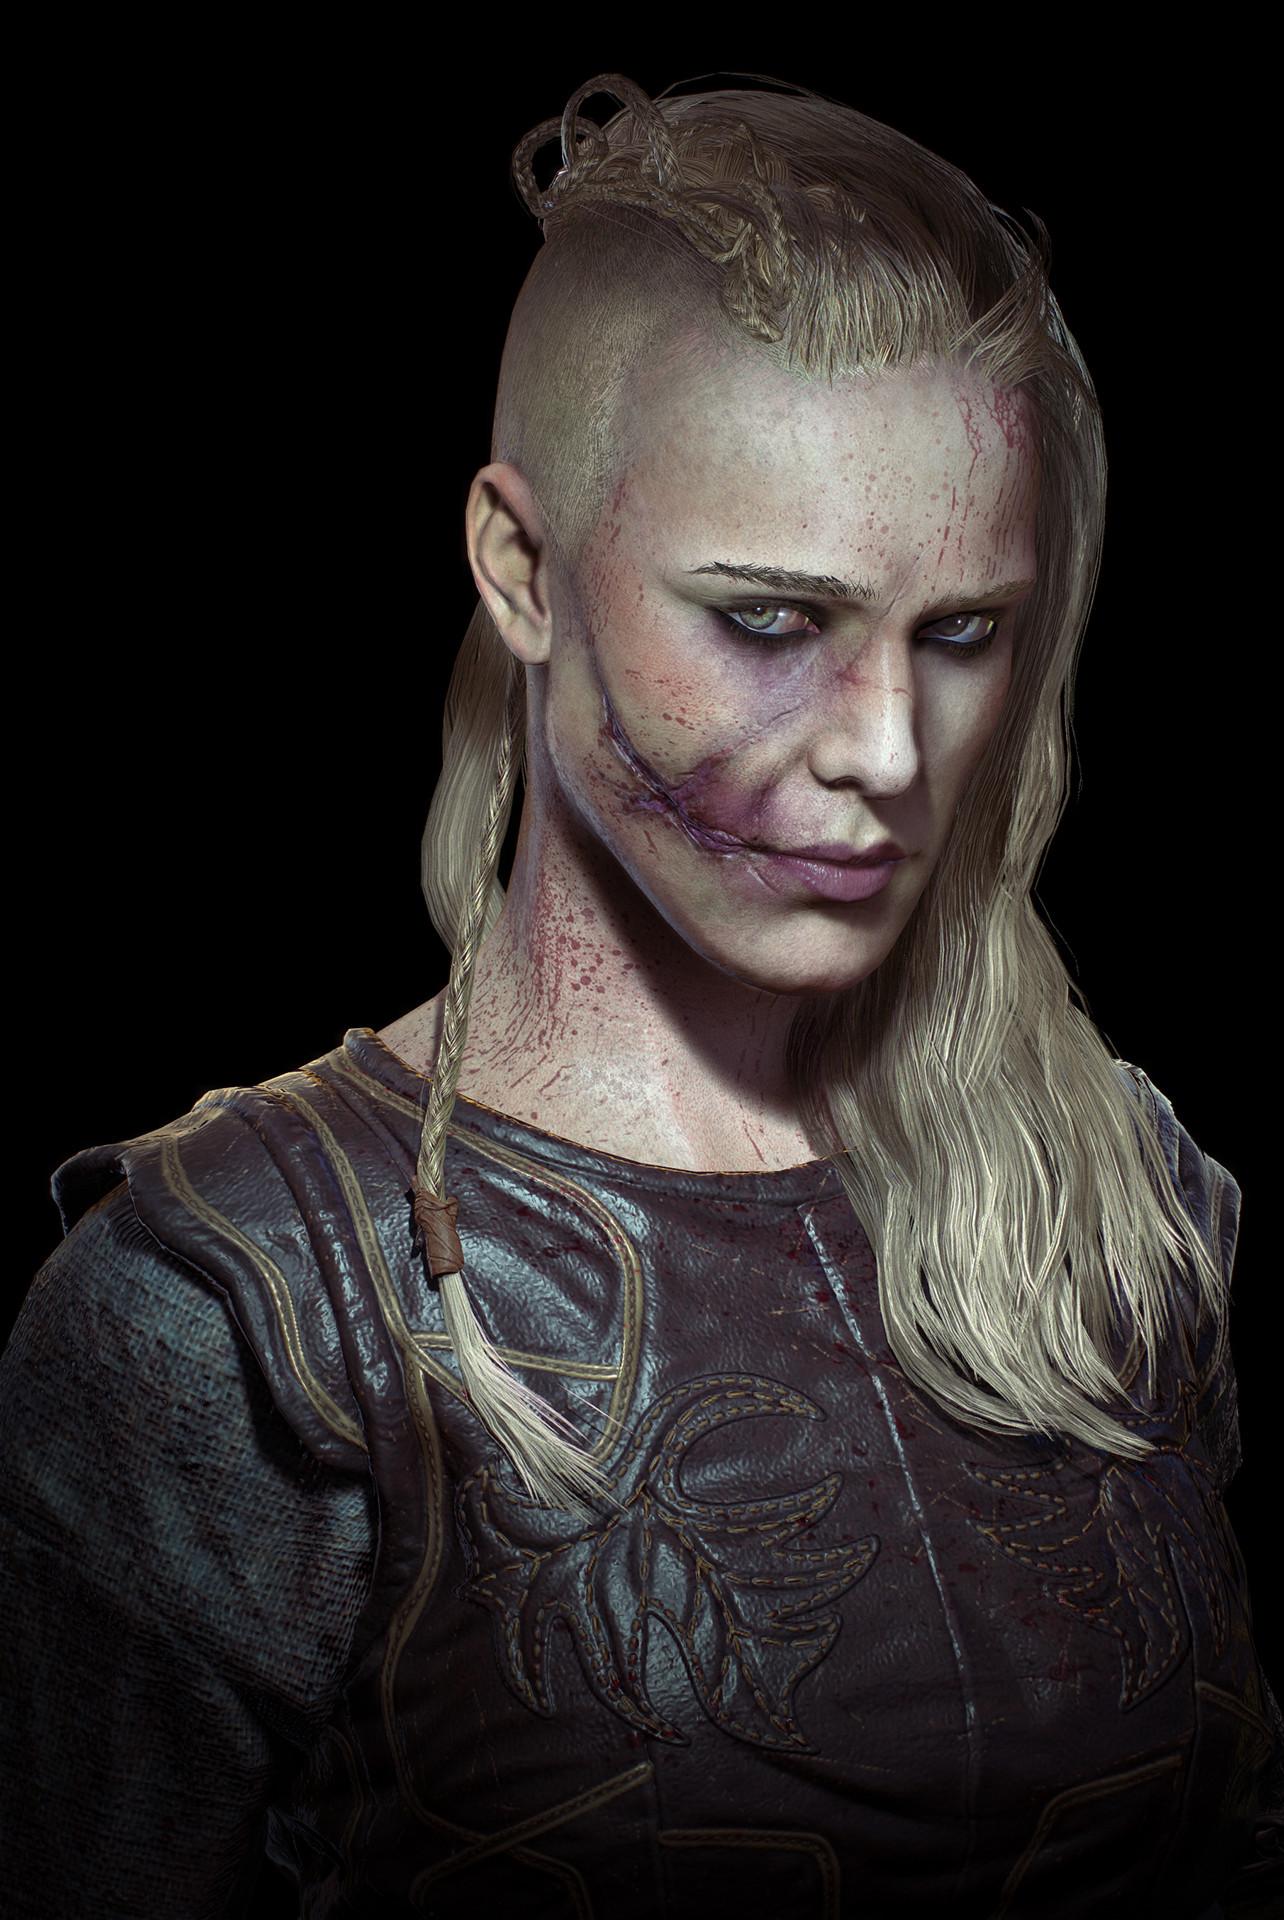 Porunn (Close Up) - Vikings Fan Art by Genci Buxheli